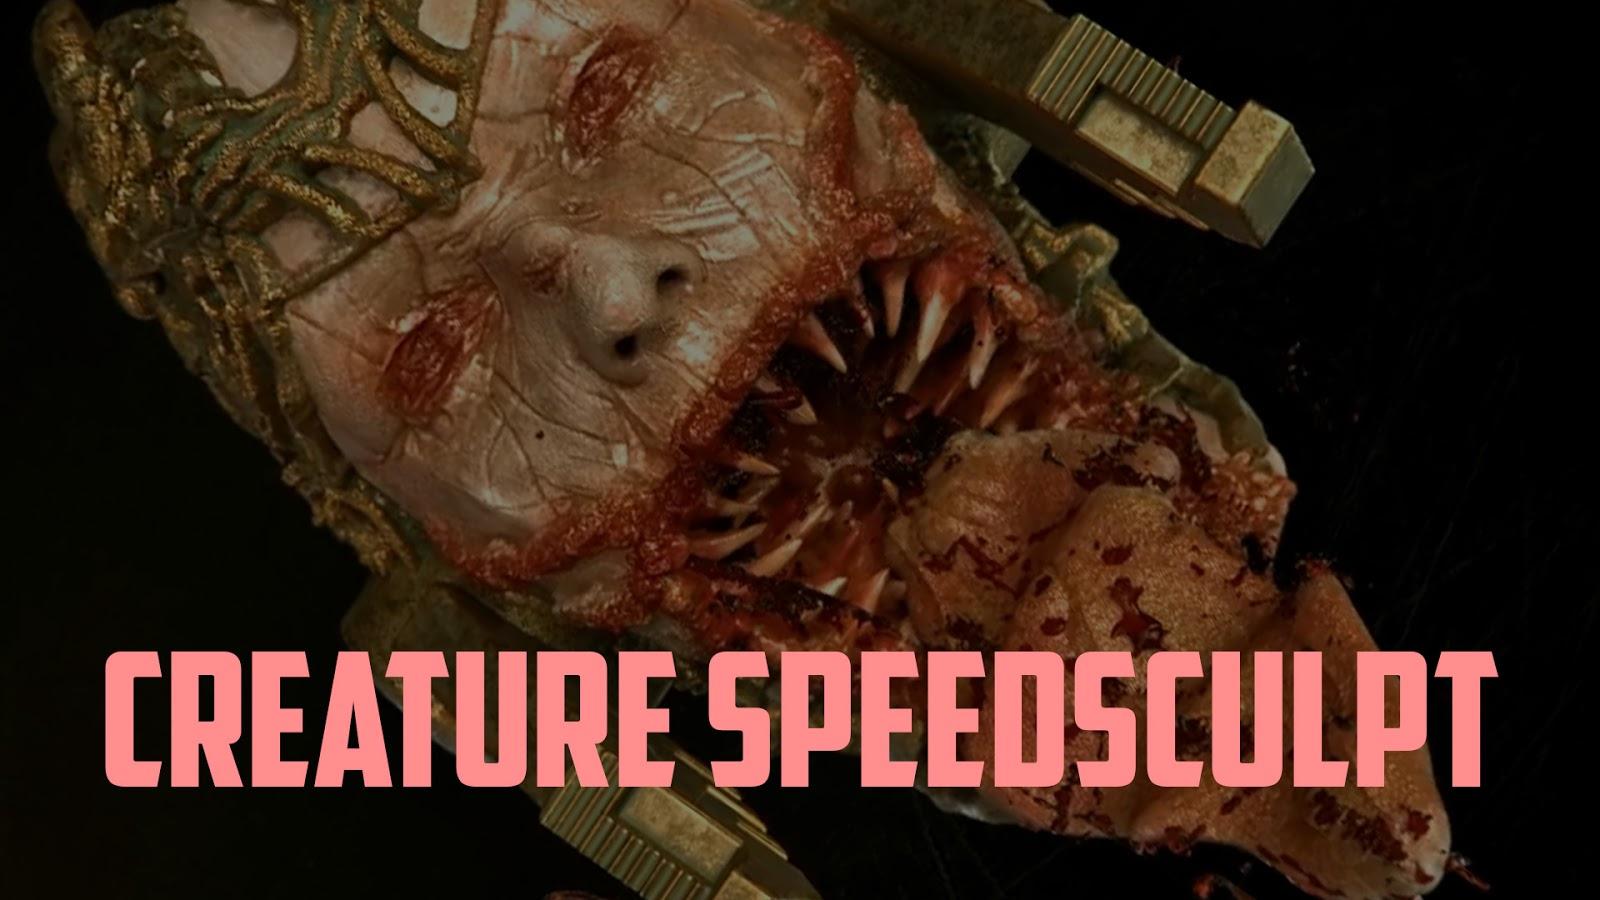 creature_speedsculpt_youtube.jpg